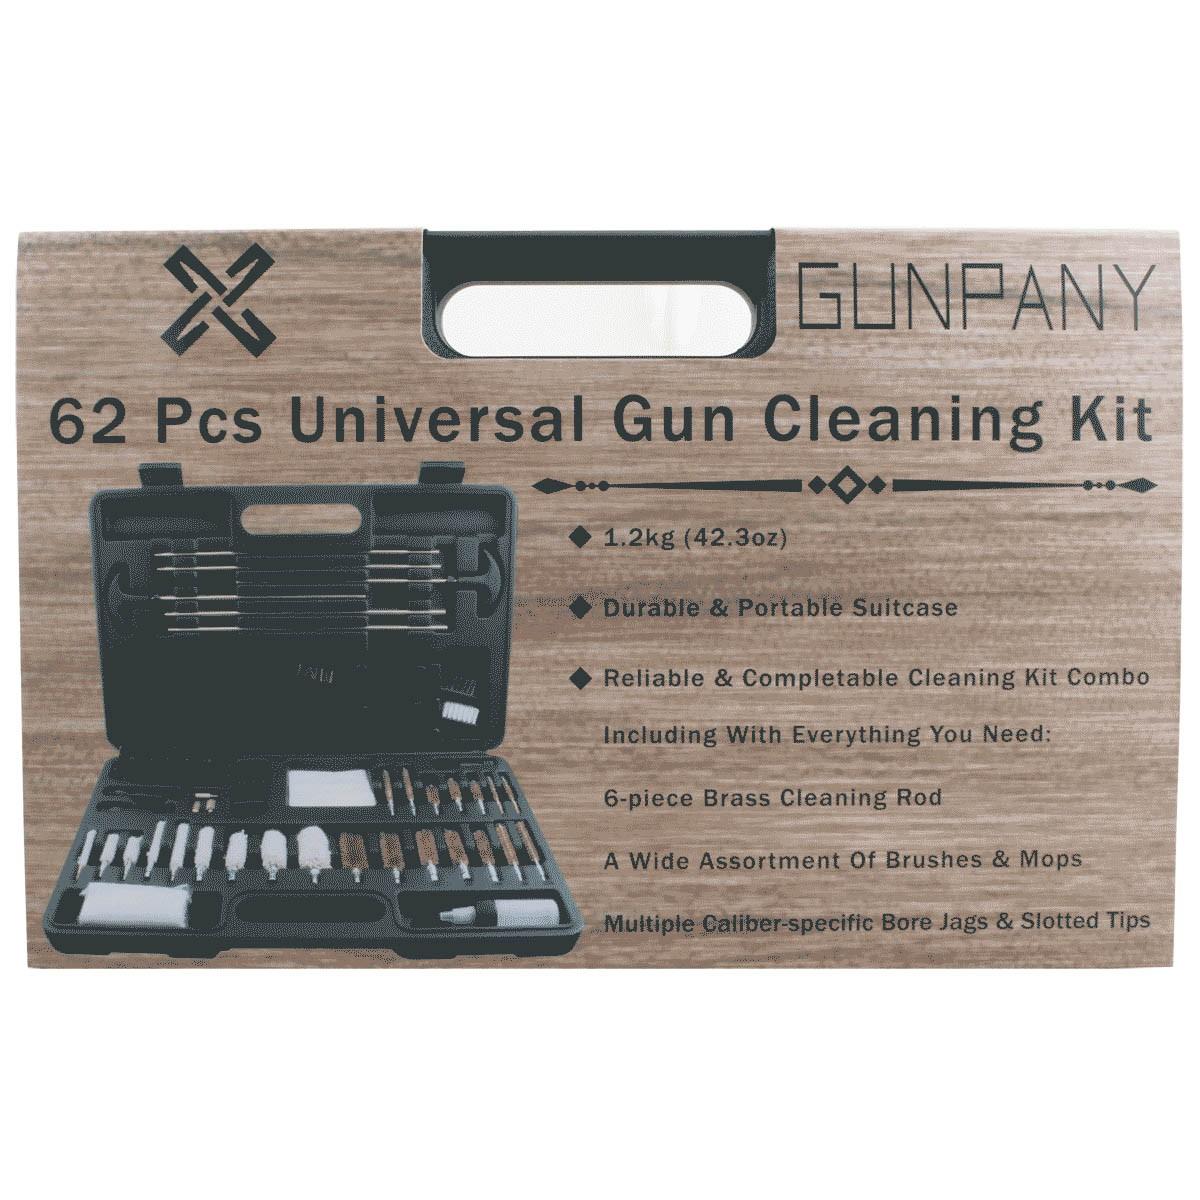 Gunpany 62 Pcs Universal Gun Cleaning Kit